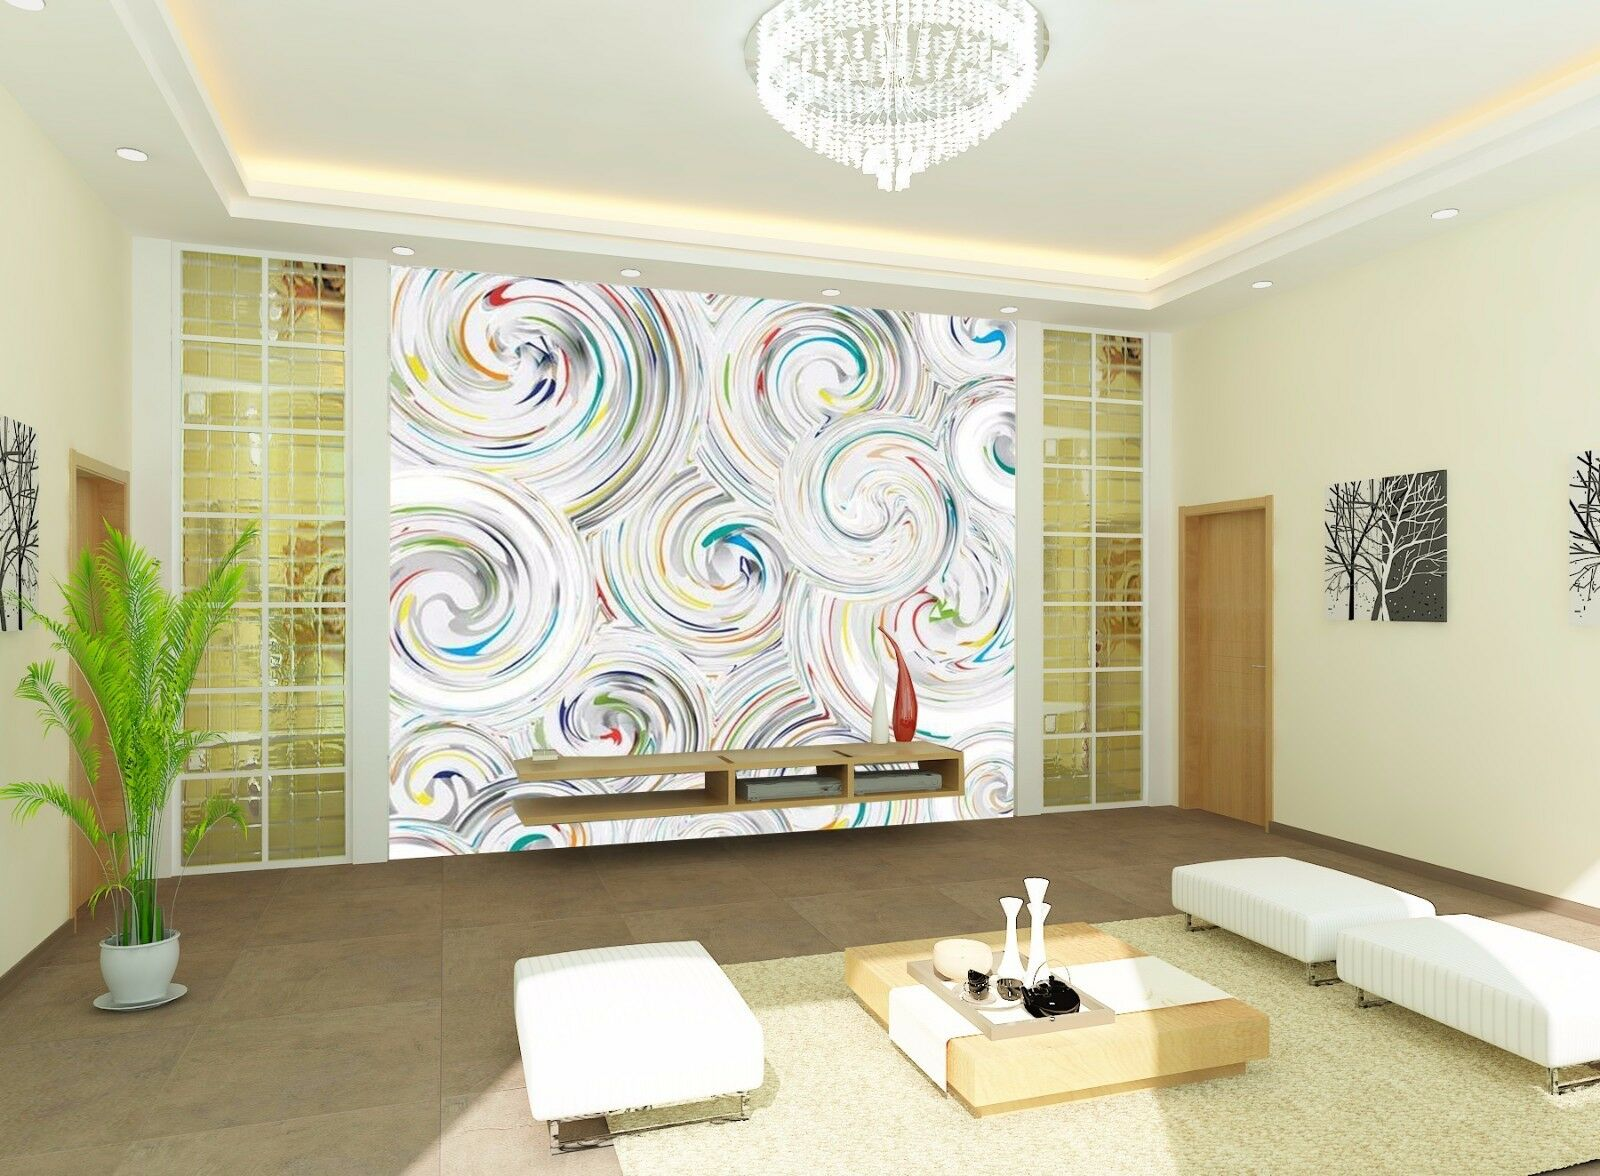 3D Spiraly 51 Wallpaper Murals Wall Print Wallpaper Mural AJ WALL AU Kyra